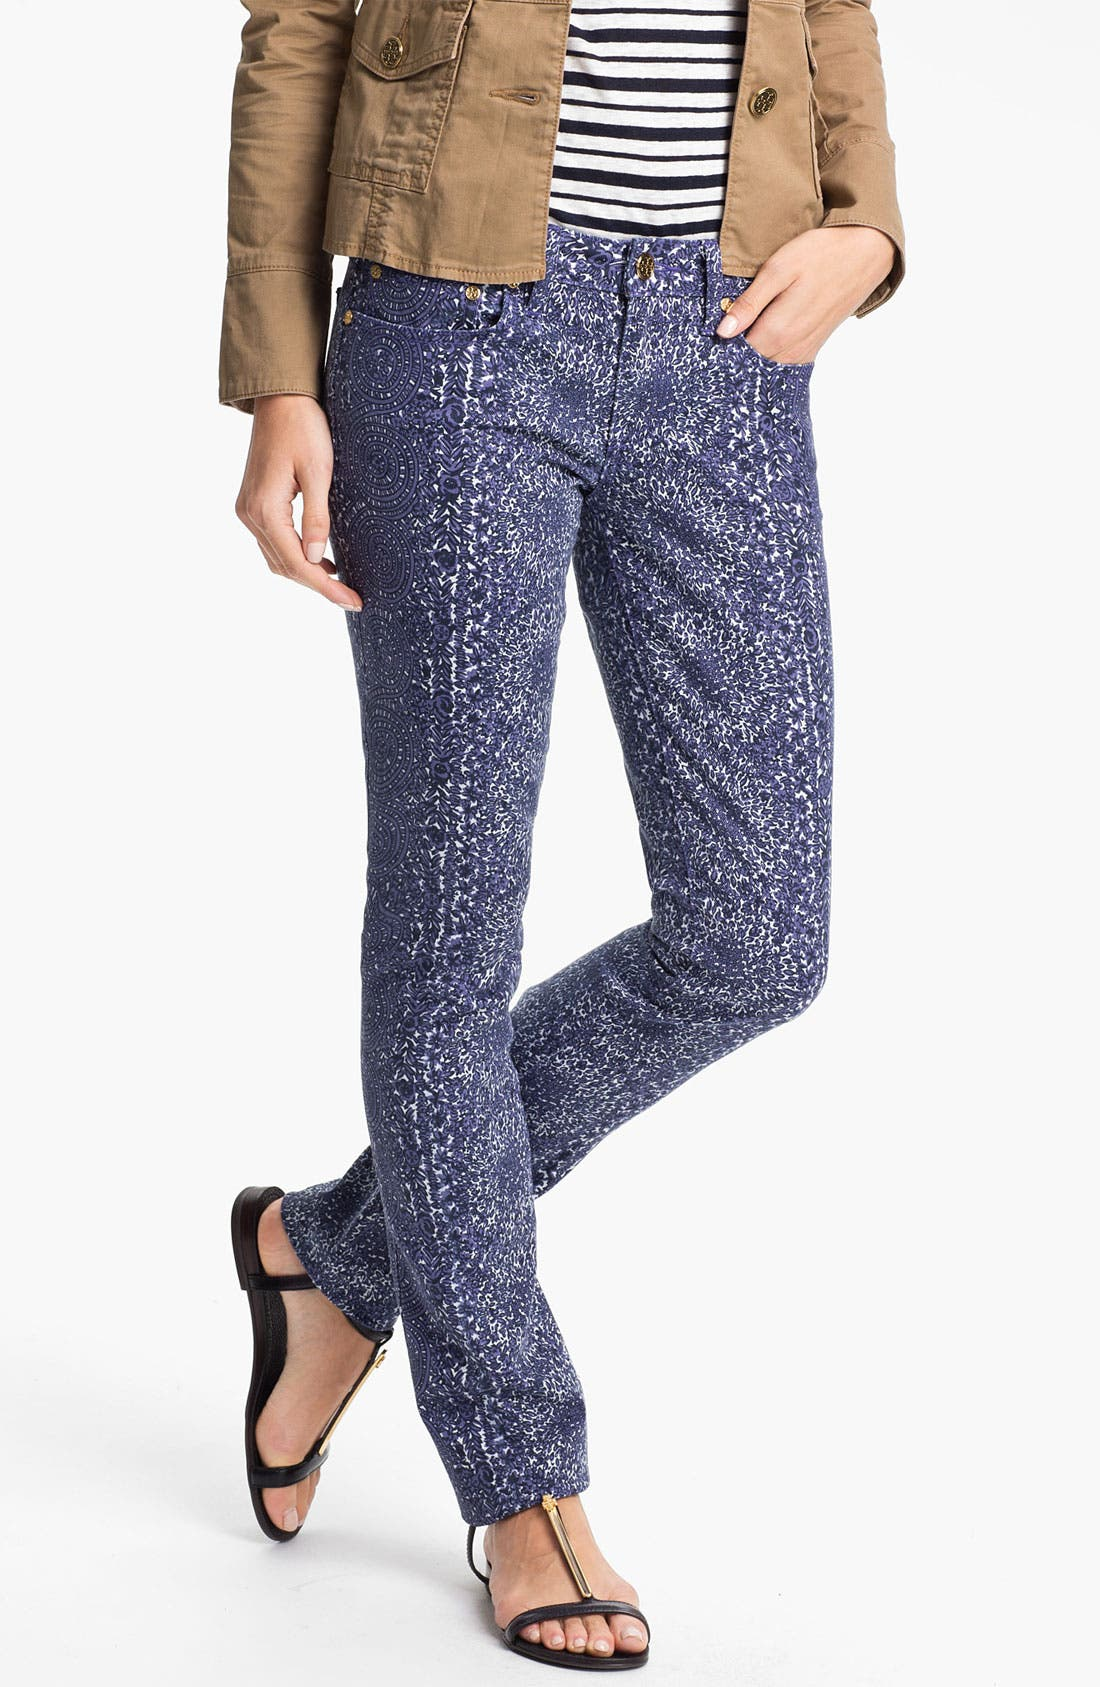 Main Image - Tory Burch 'Ivy' Print Skinny Jean